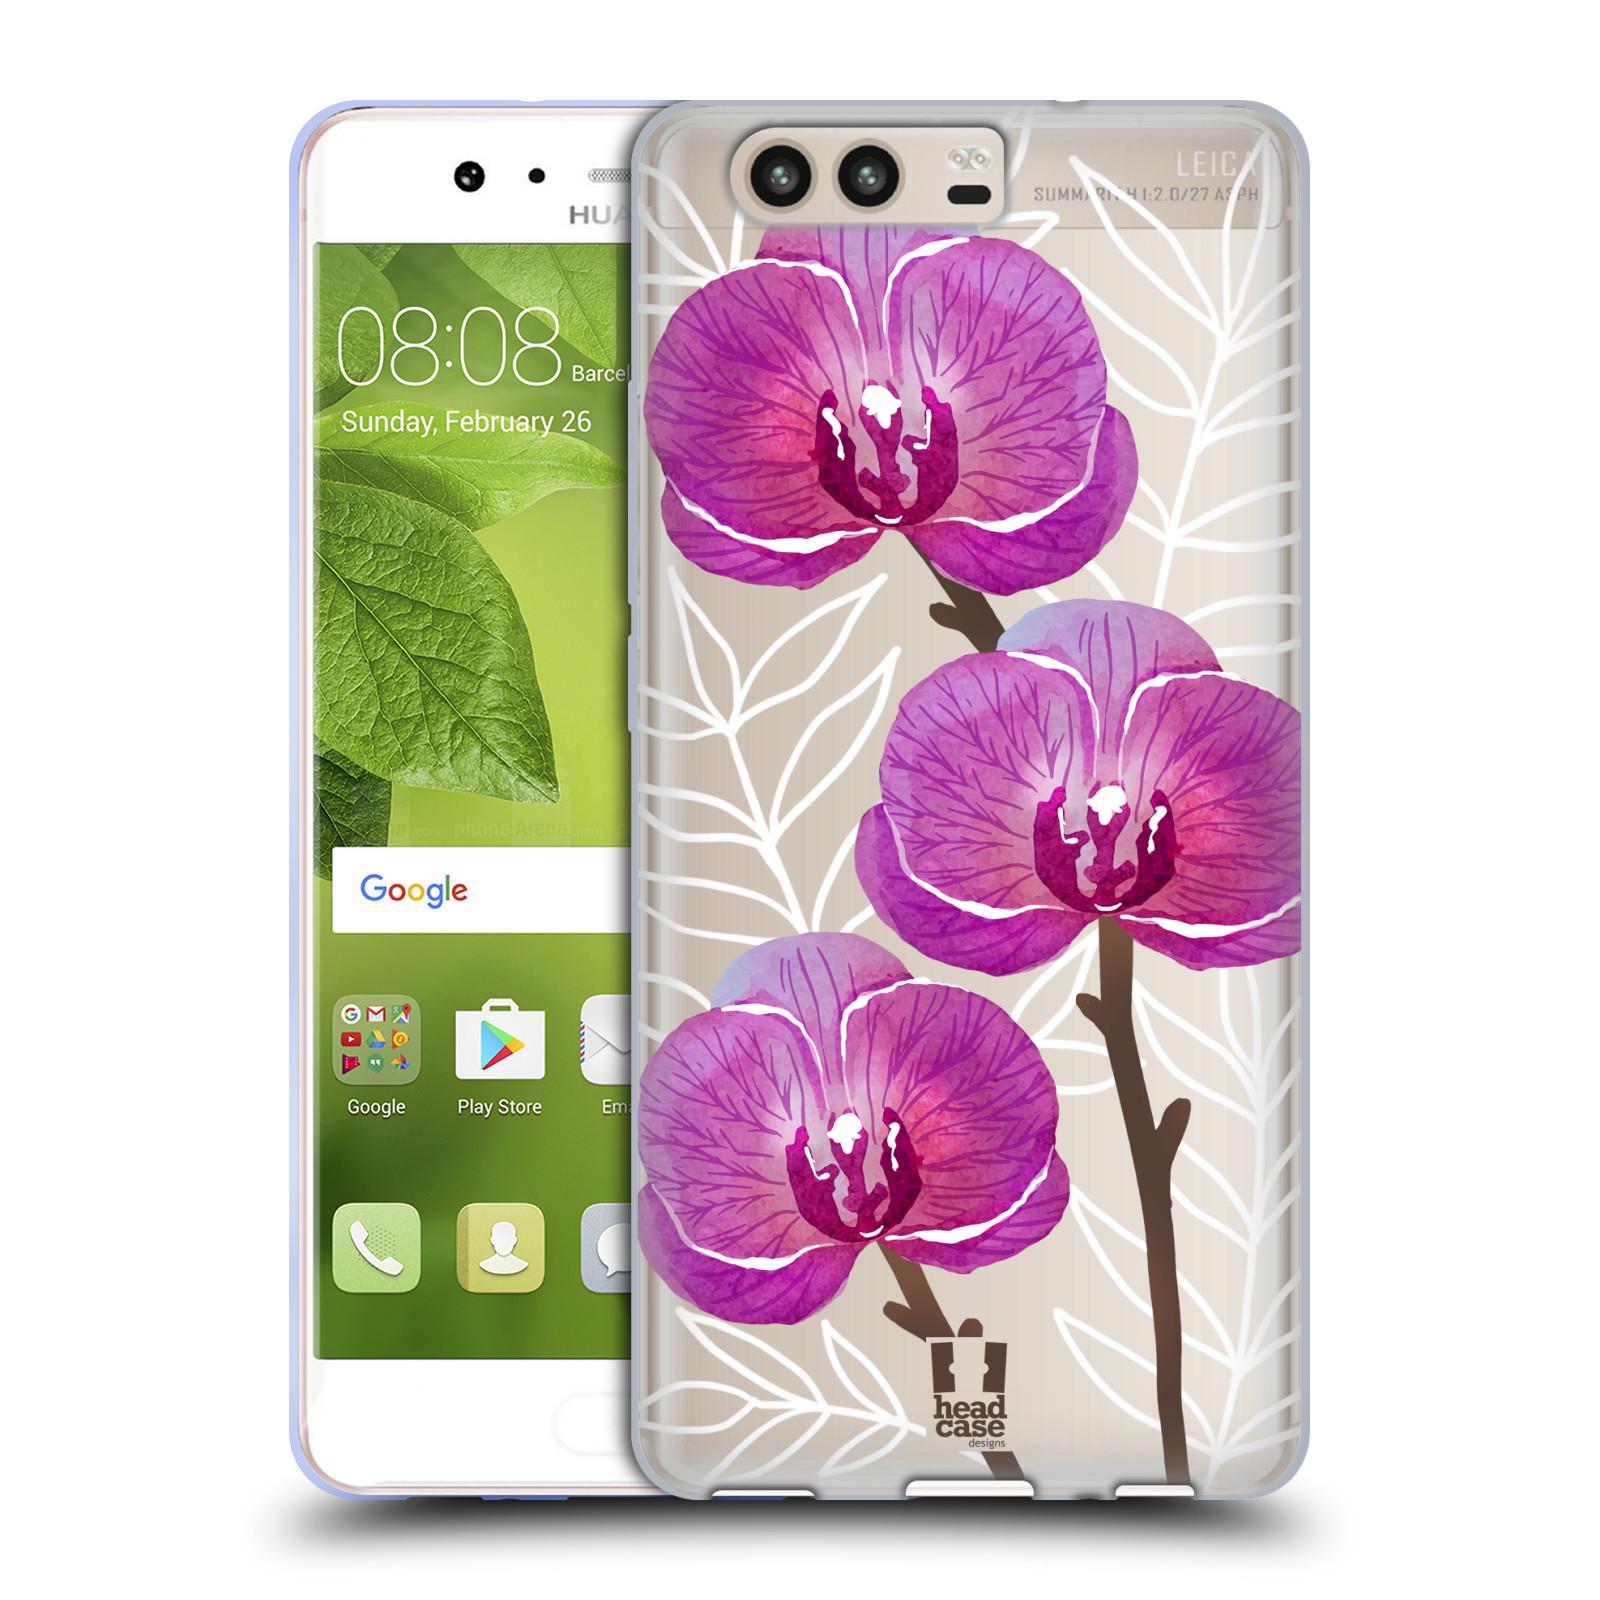 Silikonové pouzdro na mobil Huawei P10 - Head Case - Hezoučké kvítky - průhledné